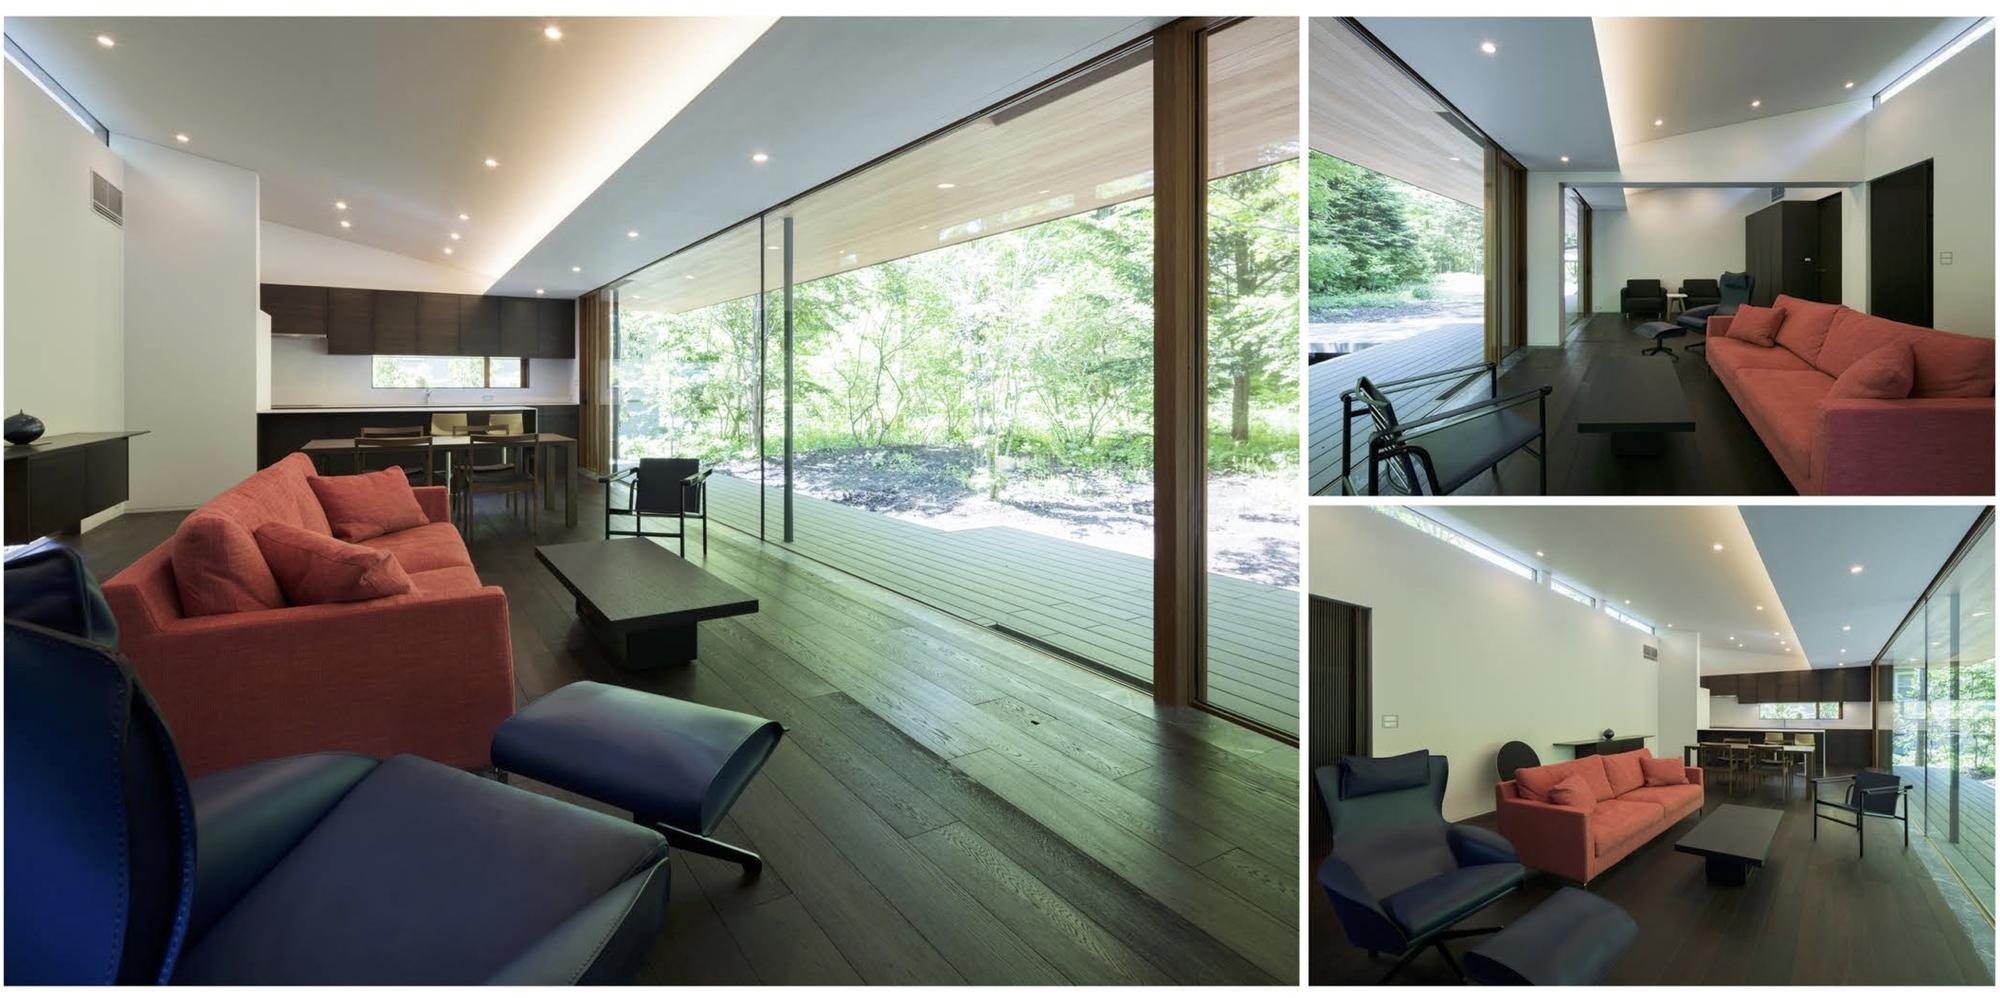 galeria de resid ncia kashino kidosaki architects studio 6. Black Bedroom Furniture Sets. Home Design Ideas